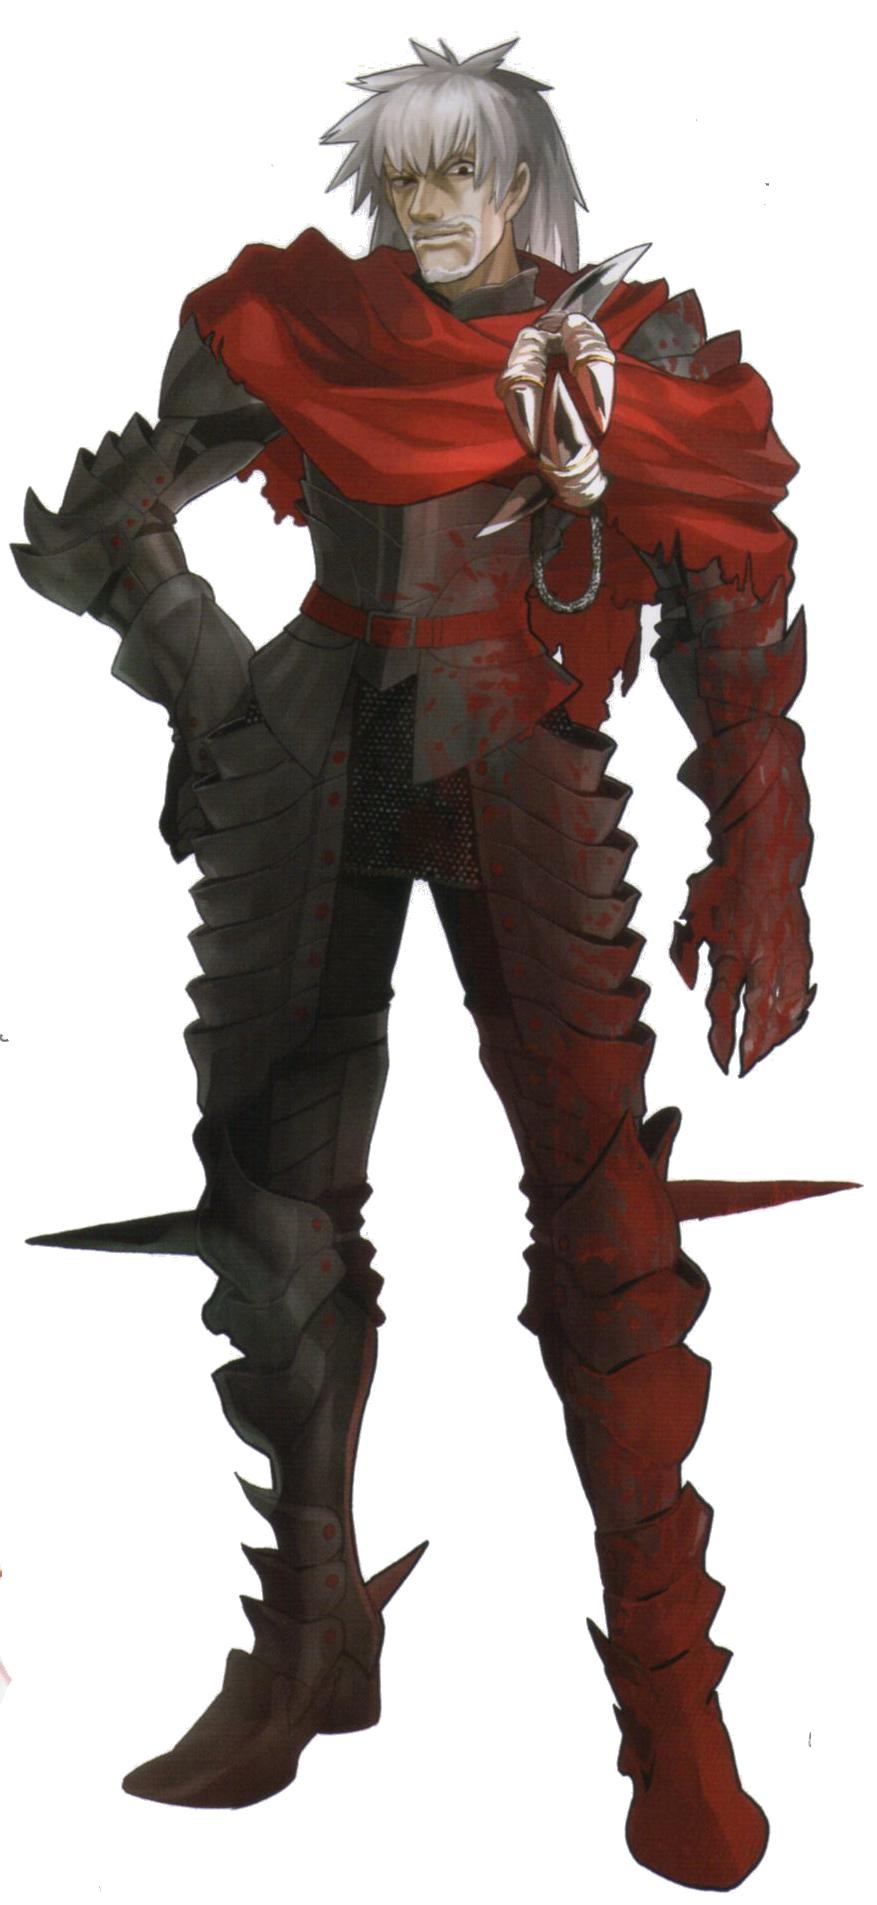 Lancer (Fate/EXTRA, route de Rin)